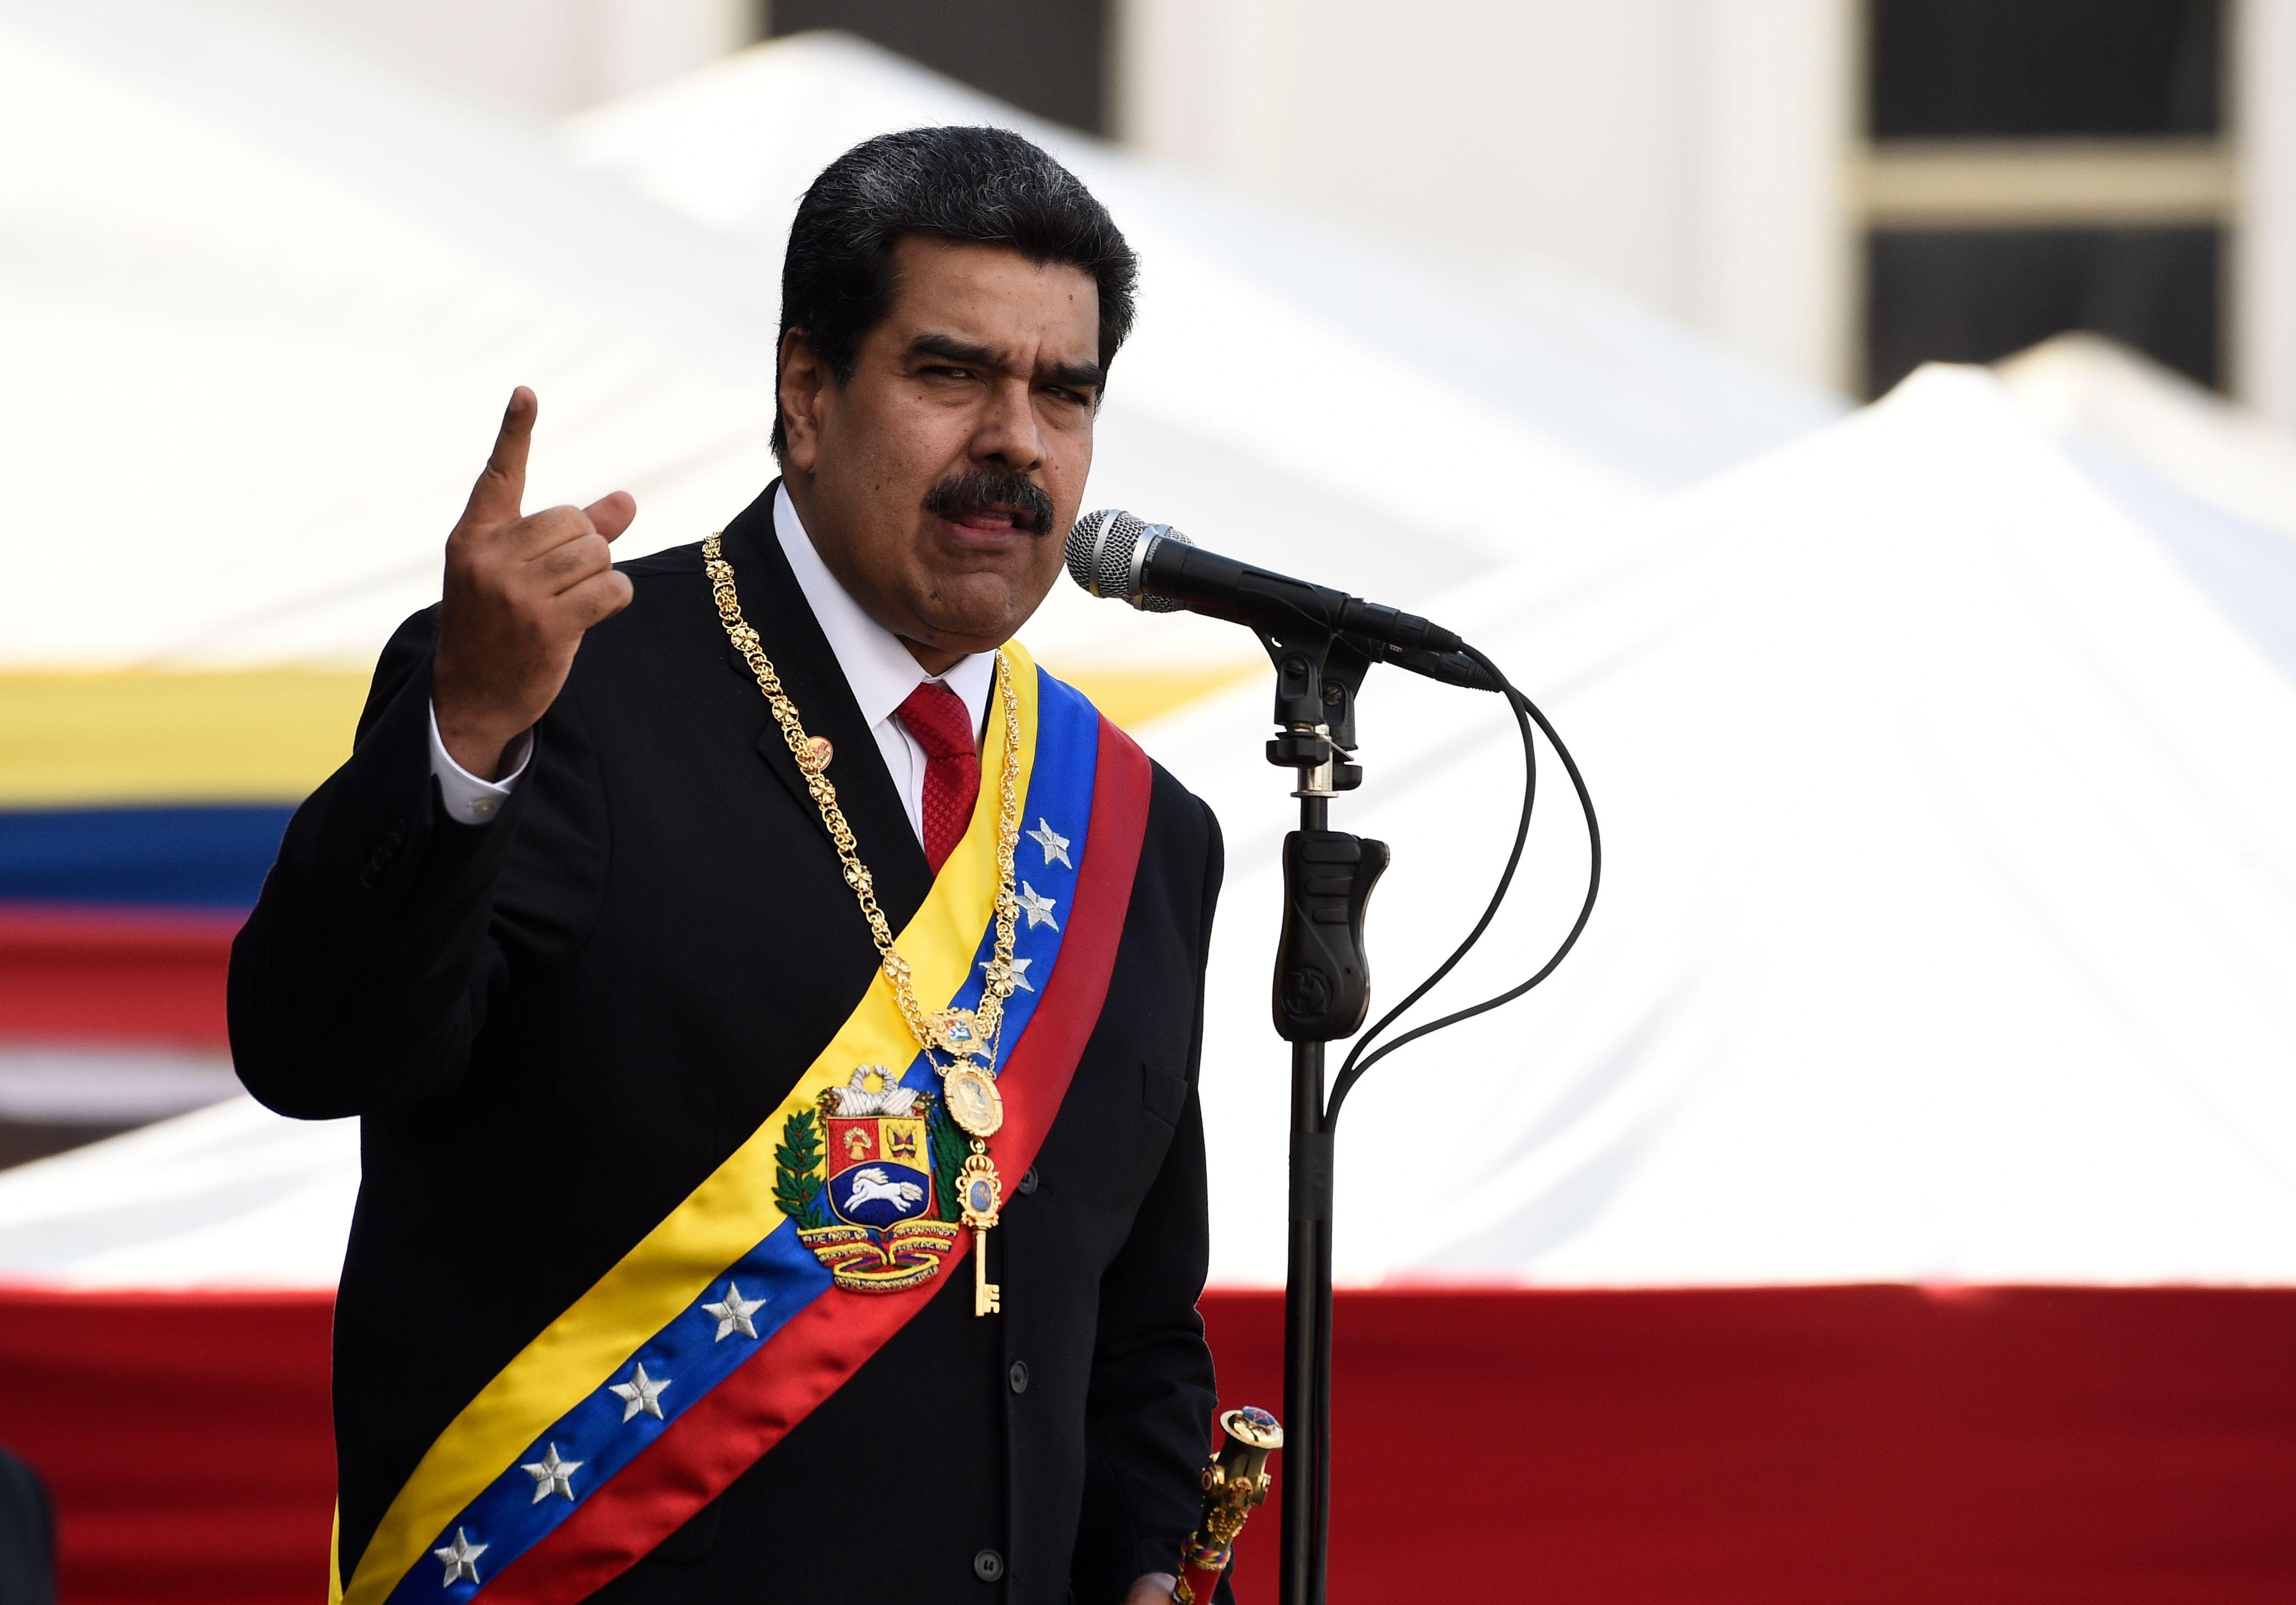 FEDERICO PARRA/AFP/Getty Images